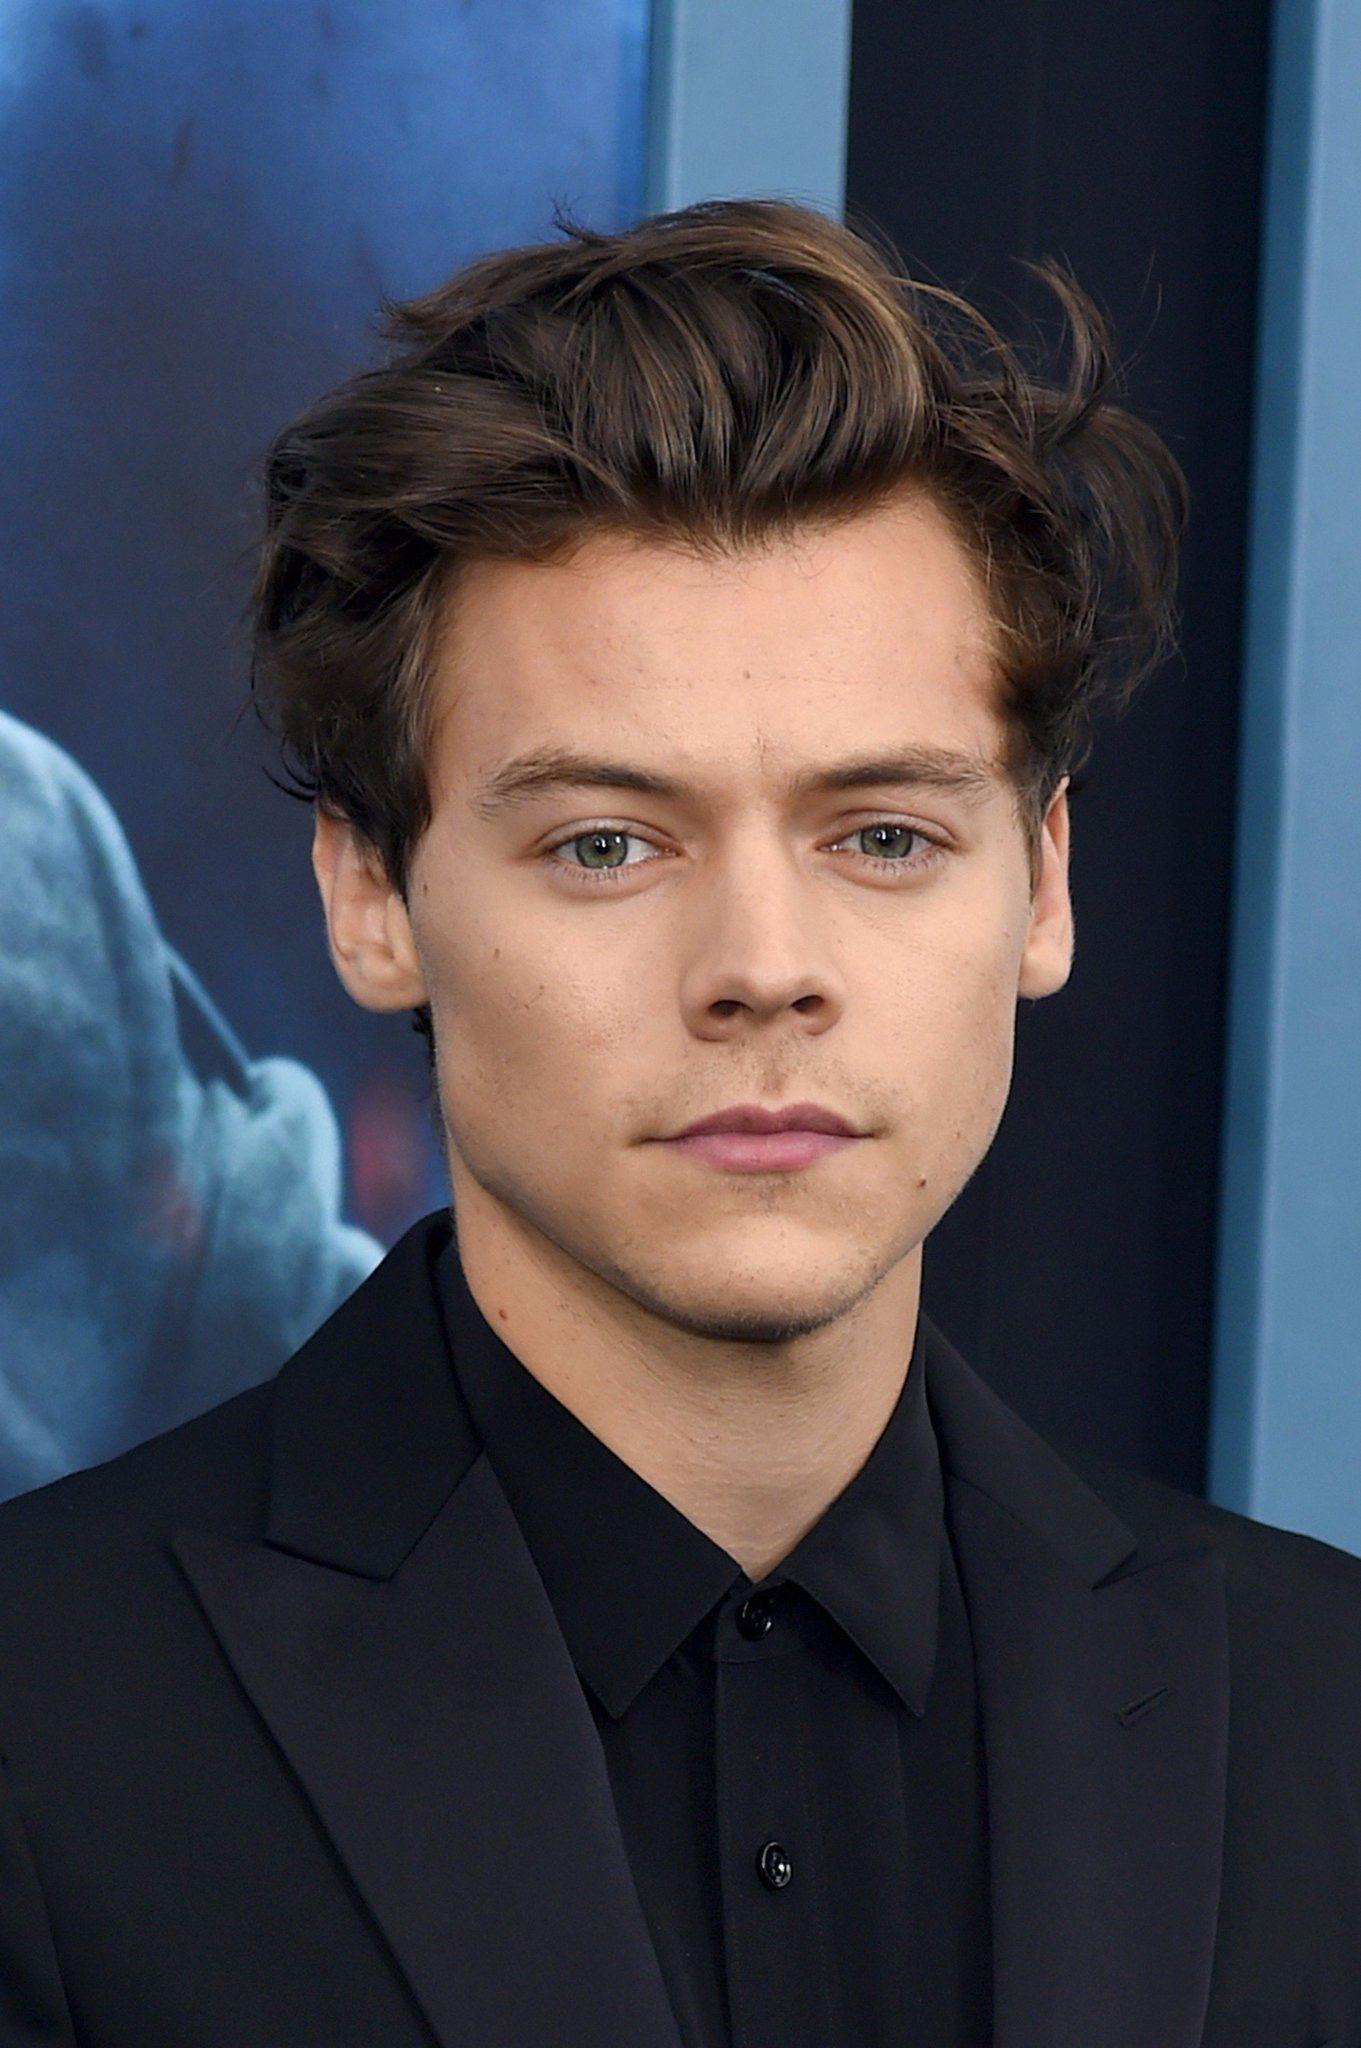 Proud As Always Harry Styles Dunkirk Harry Styles Face Harry Styles